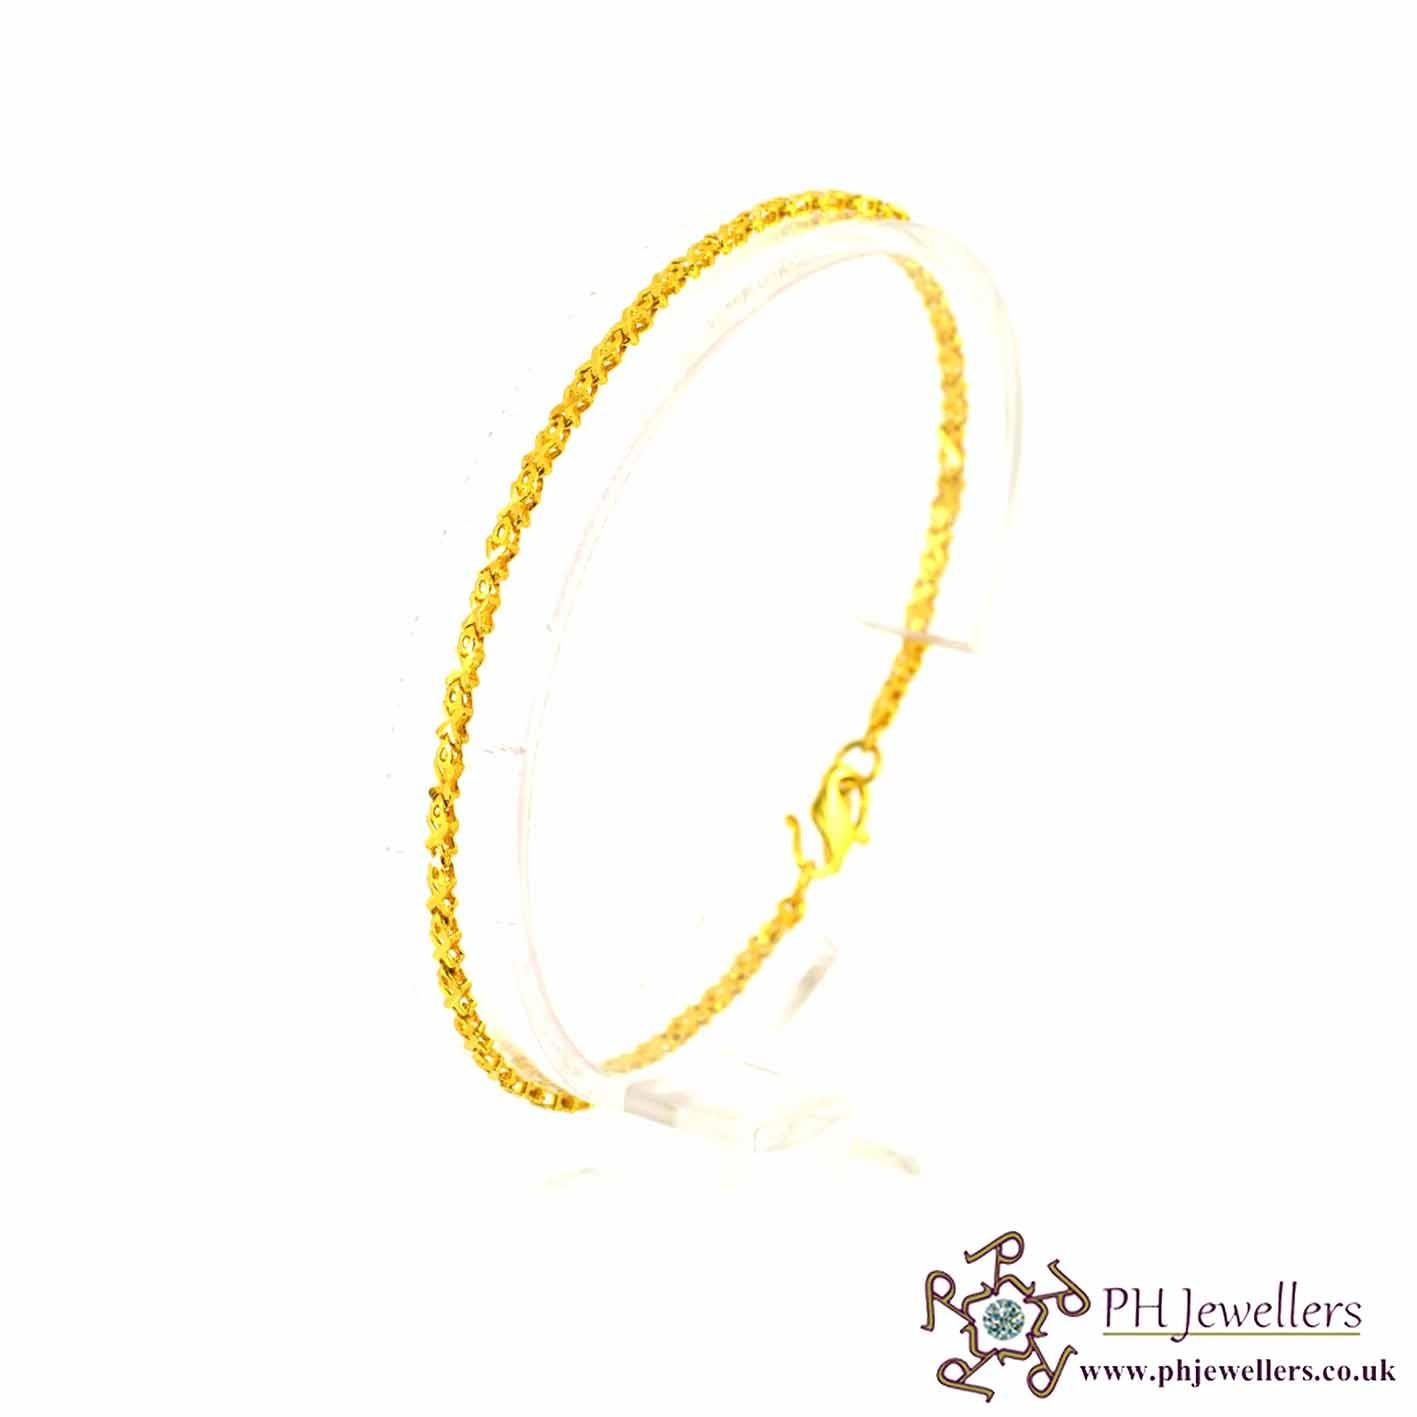 22ct 916 Hallmark Yellow Gold Bracelet LB23